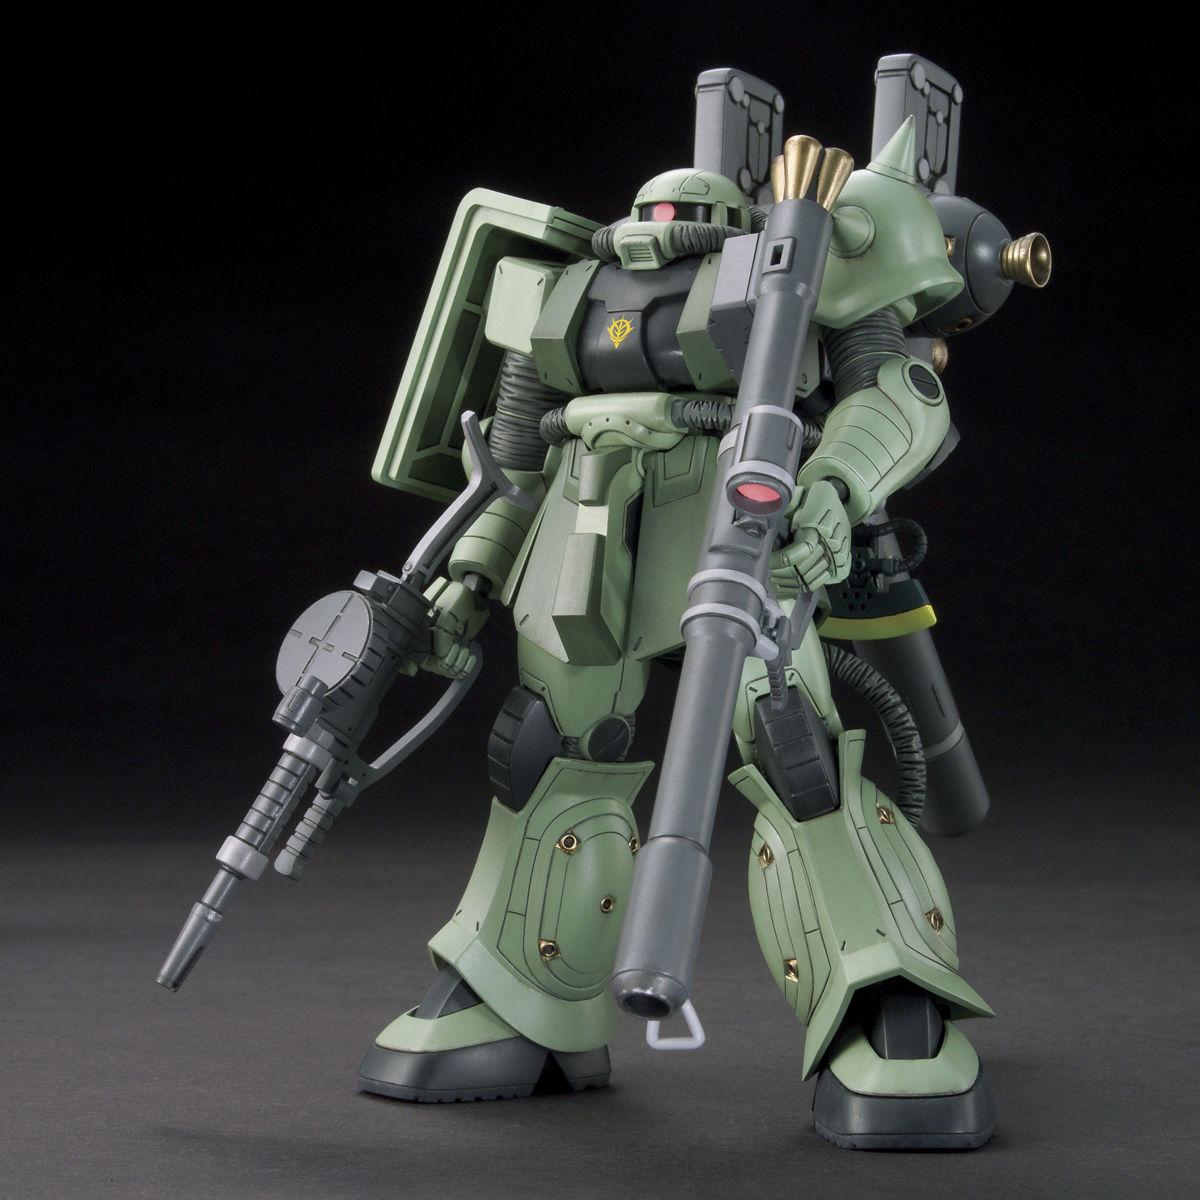 HGTB 1/144 MS-06 量産型ザク(ガンダム サンダーボルト版) [Zaku II (Thunderbolt Manga Ver.)]